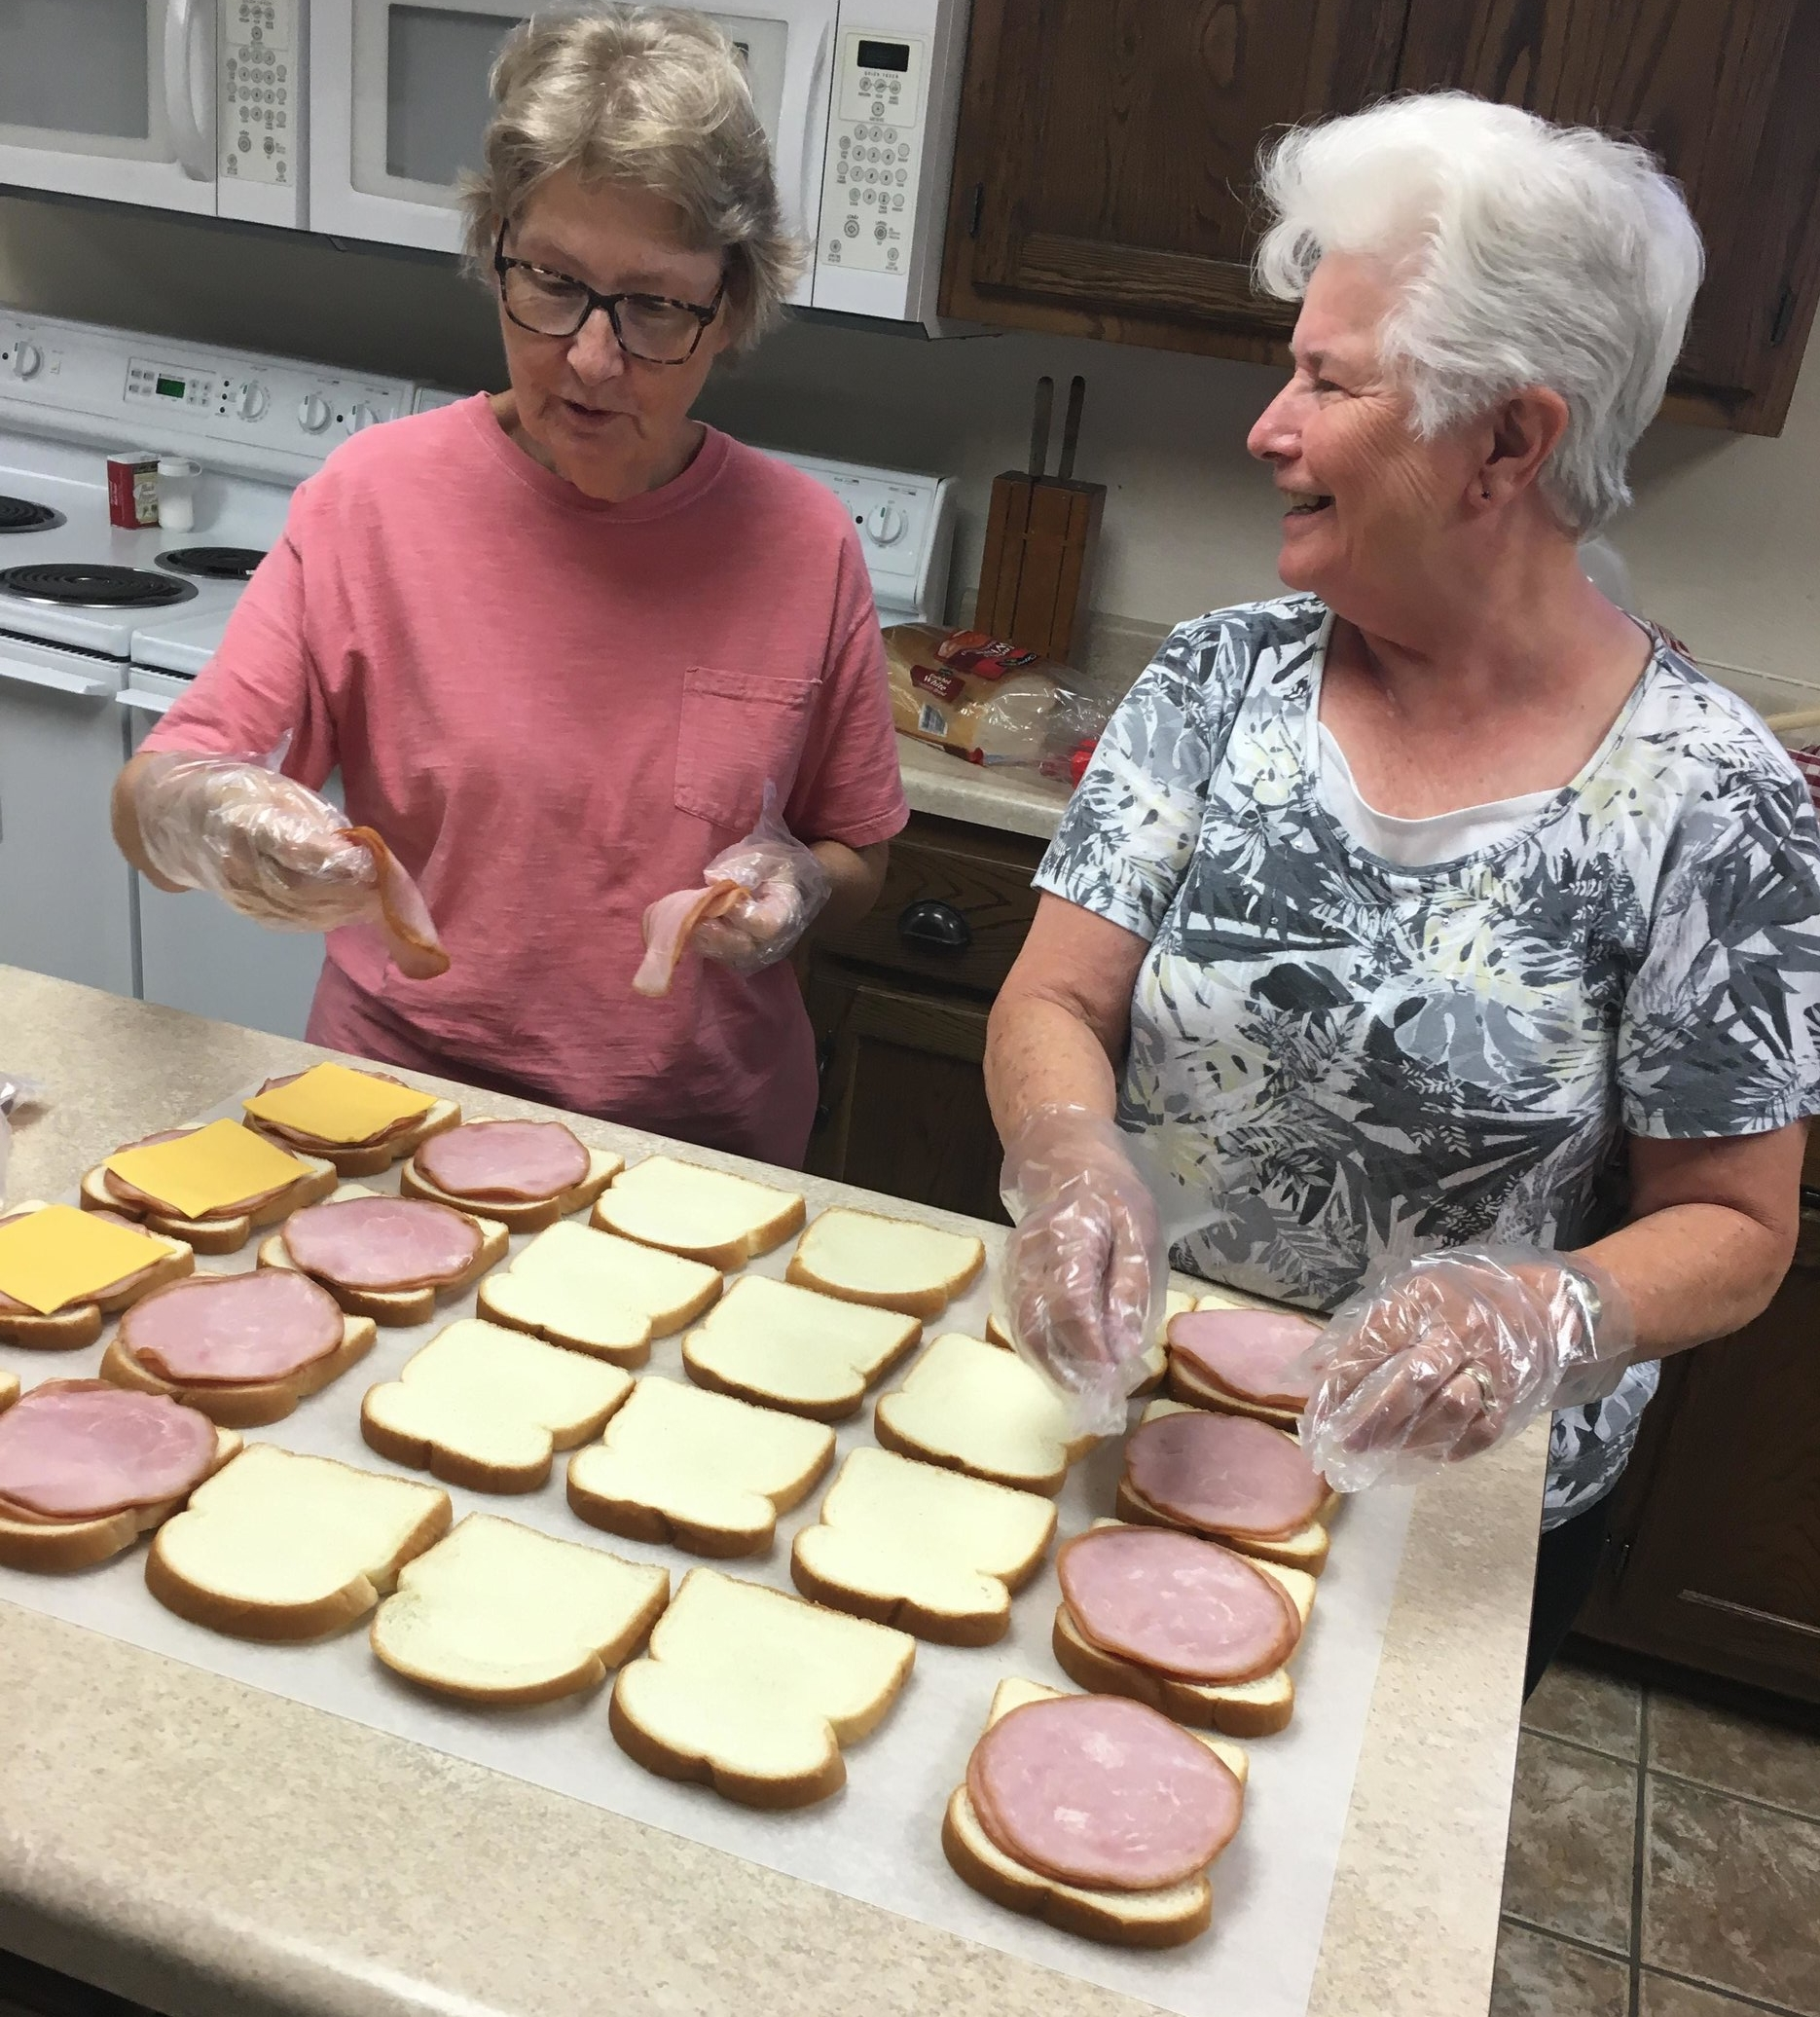 making sandwiches.JPG